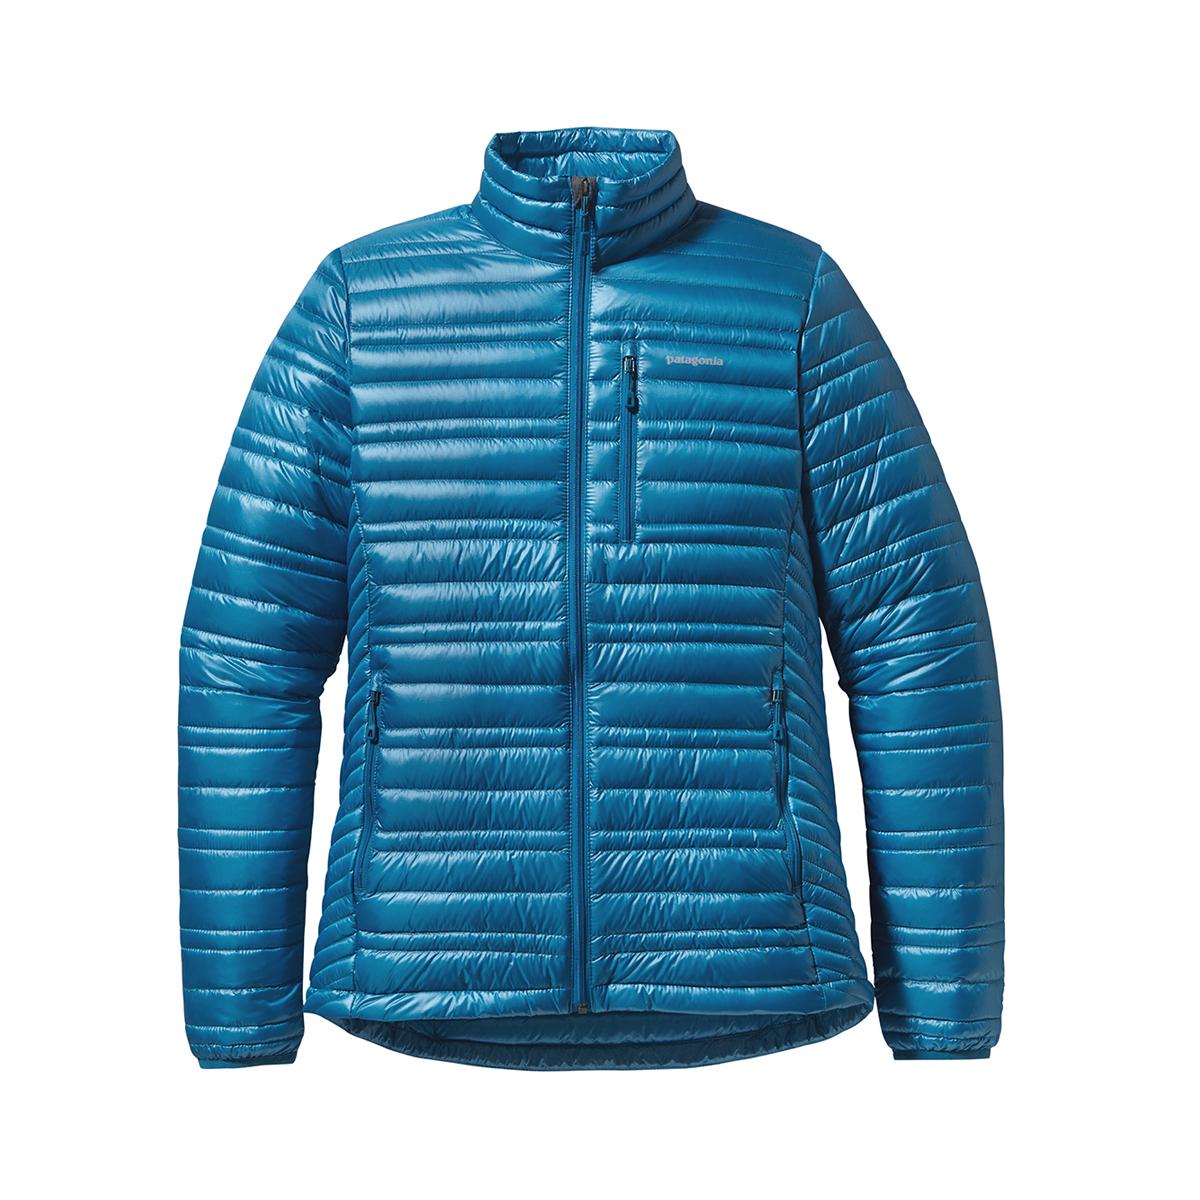 Patagonia womens ultralight down jacket